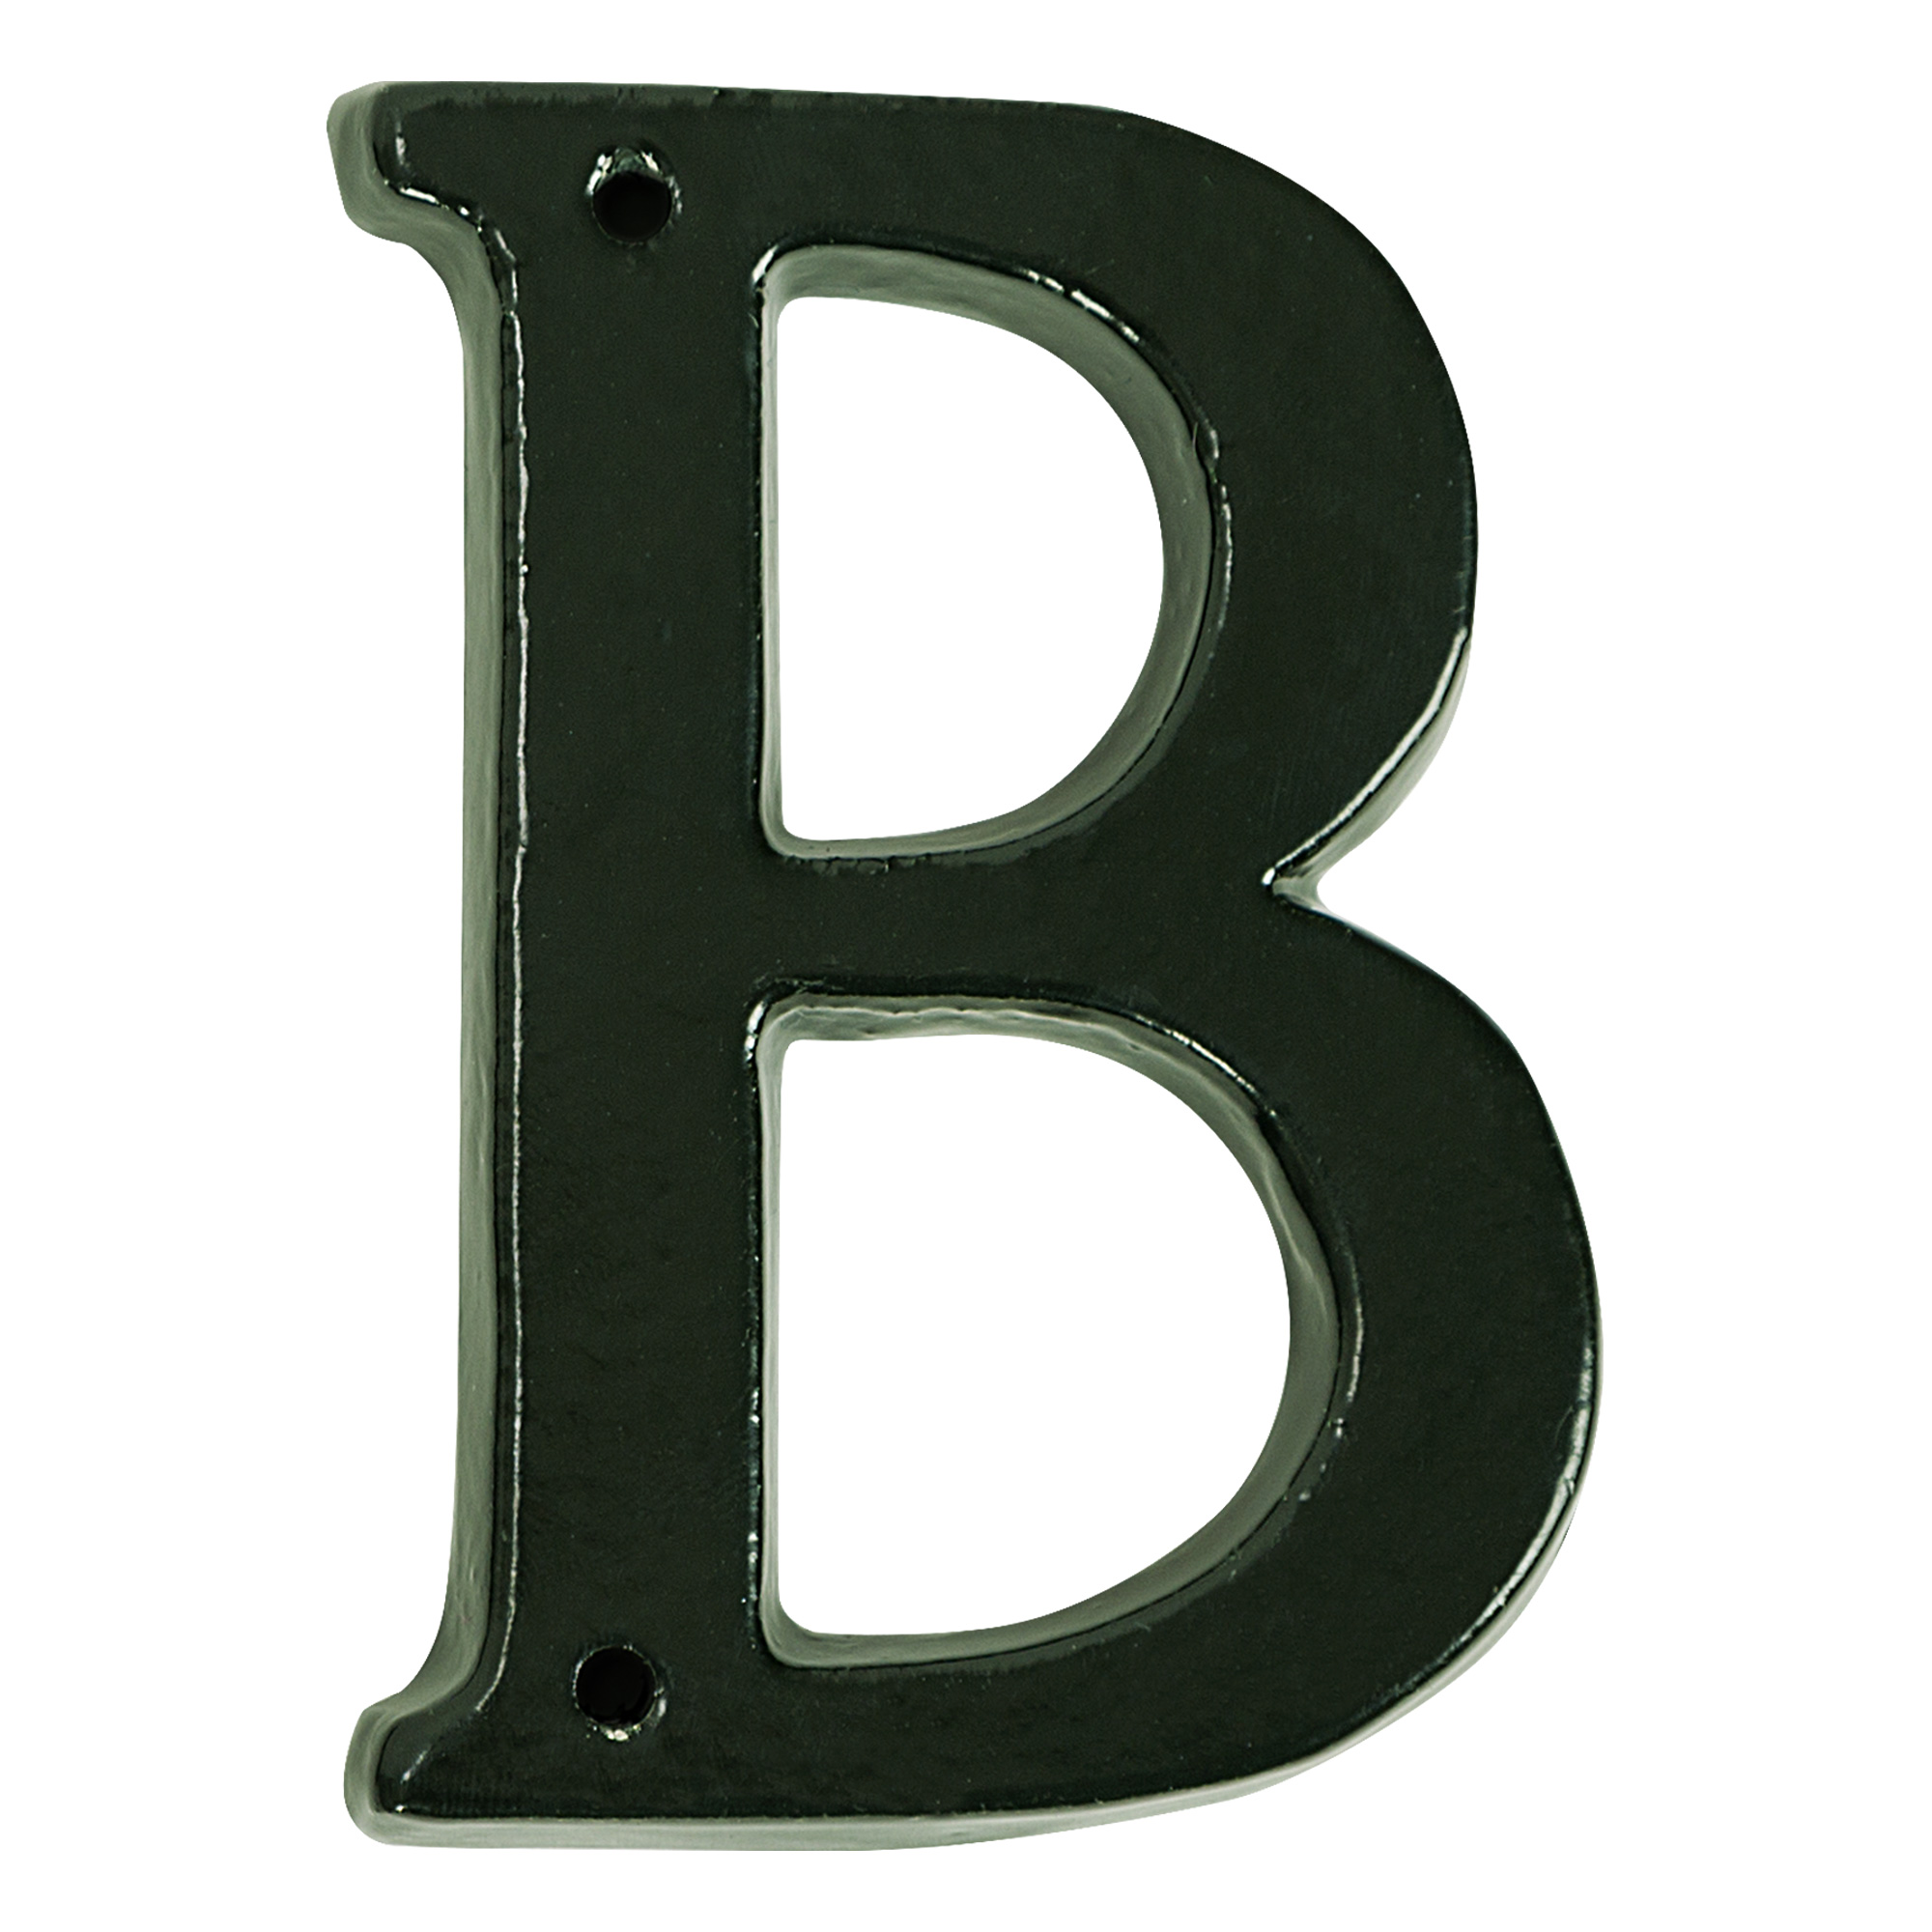 Huisnummer toevoeging B